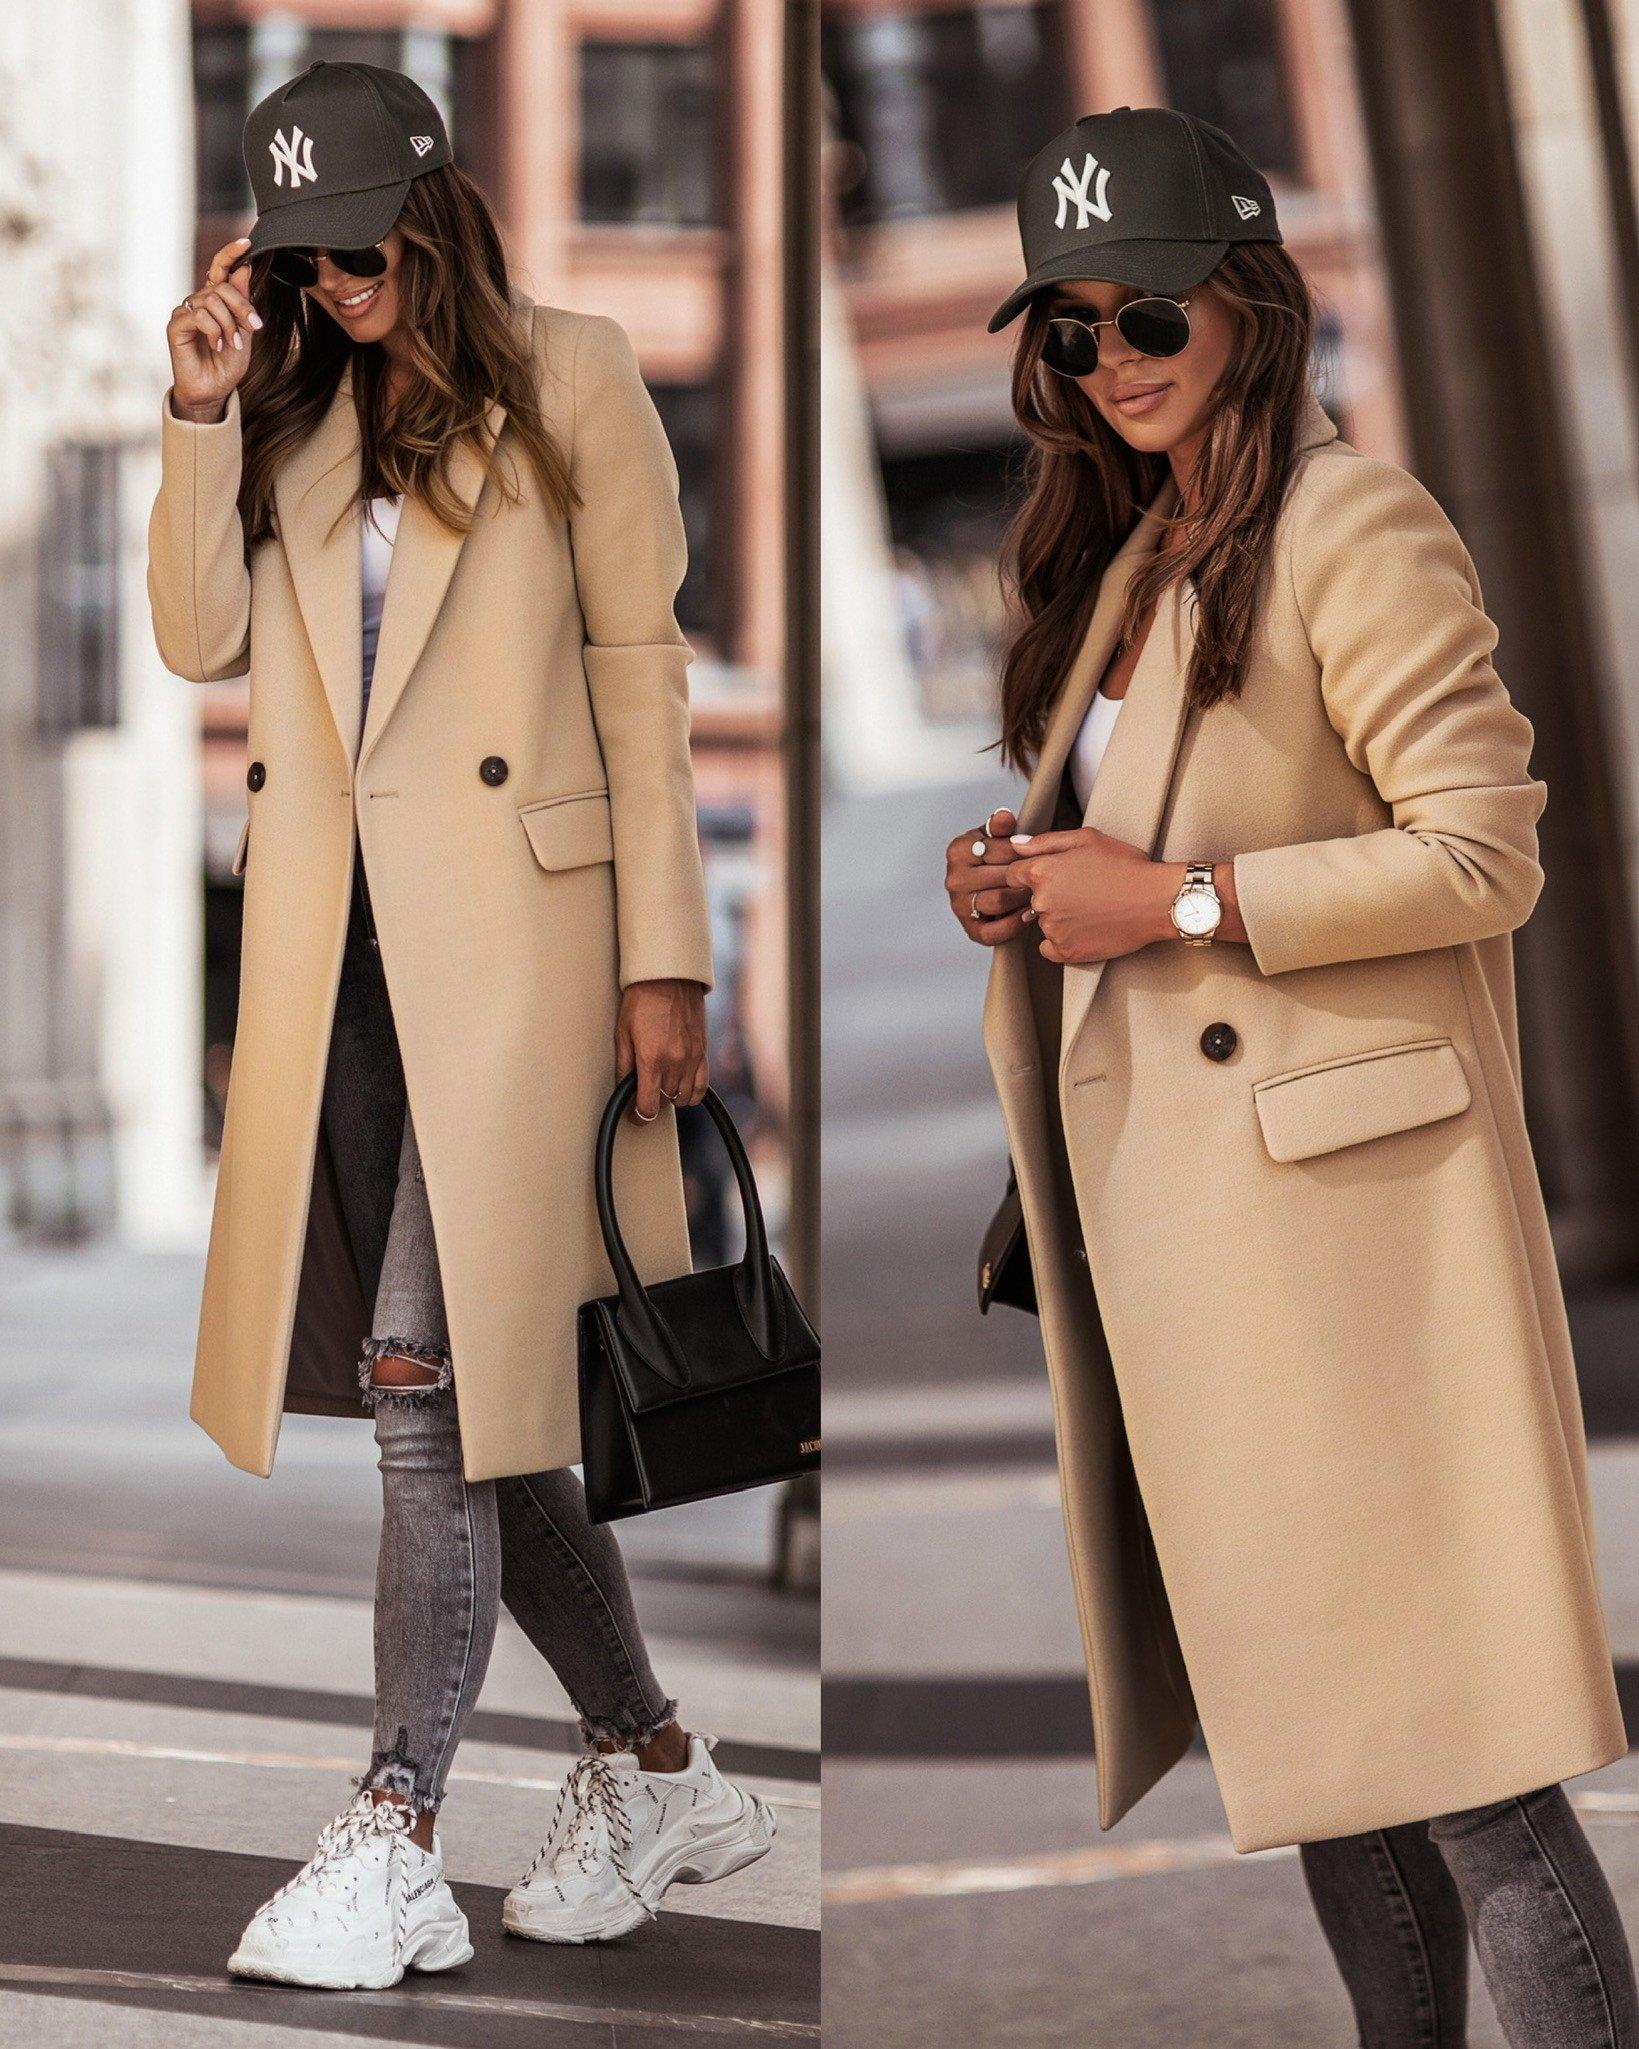 Płaszcz Corrido by Varlesca dark beige